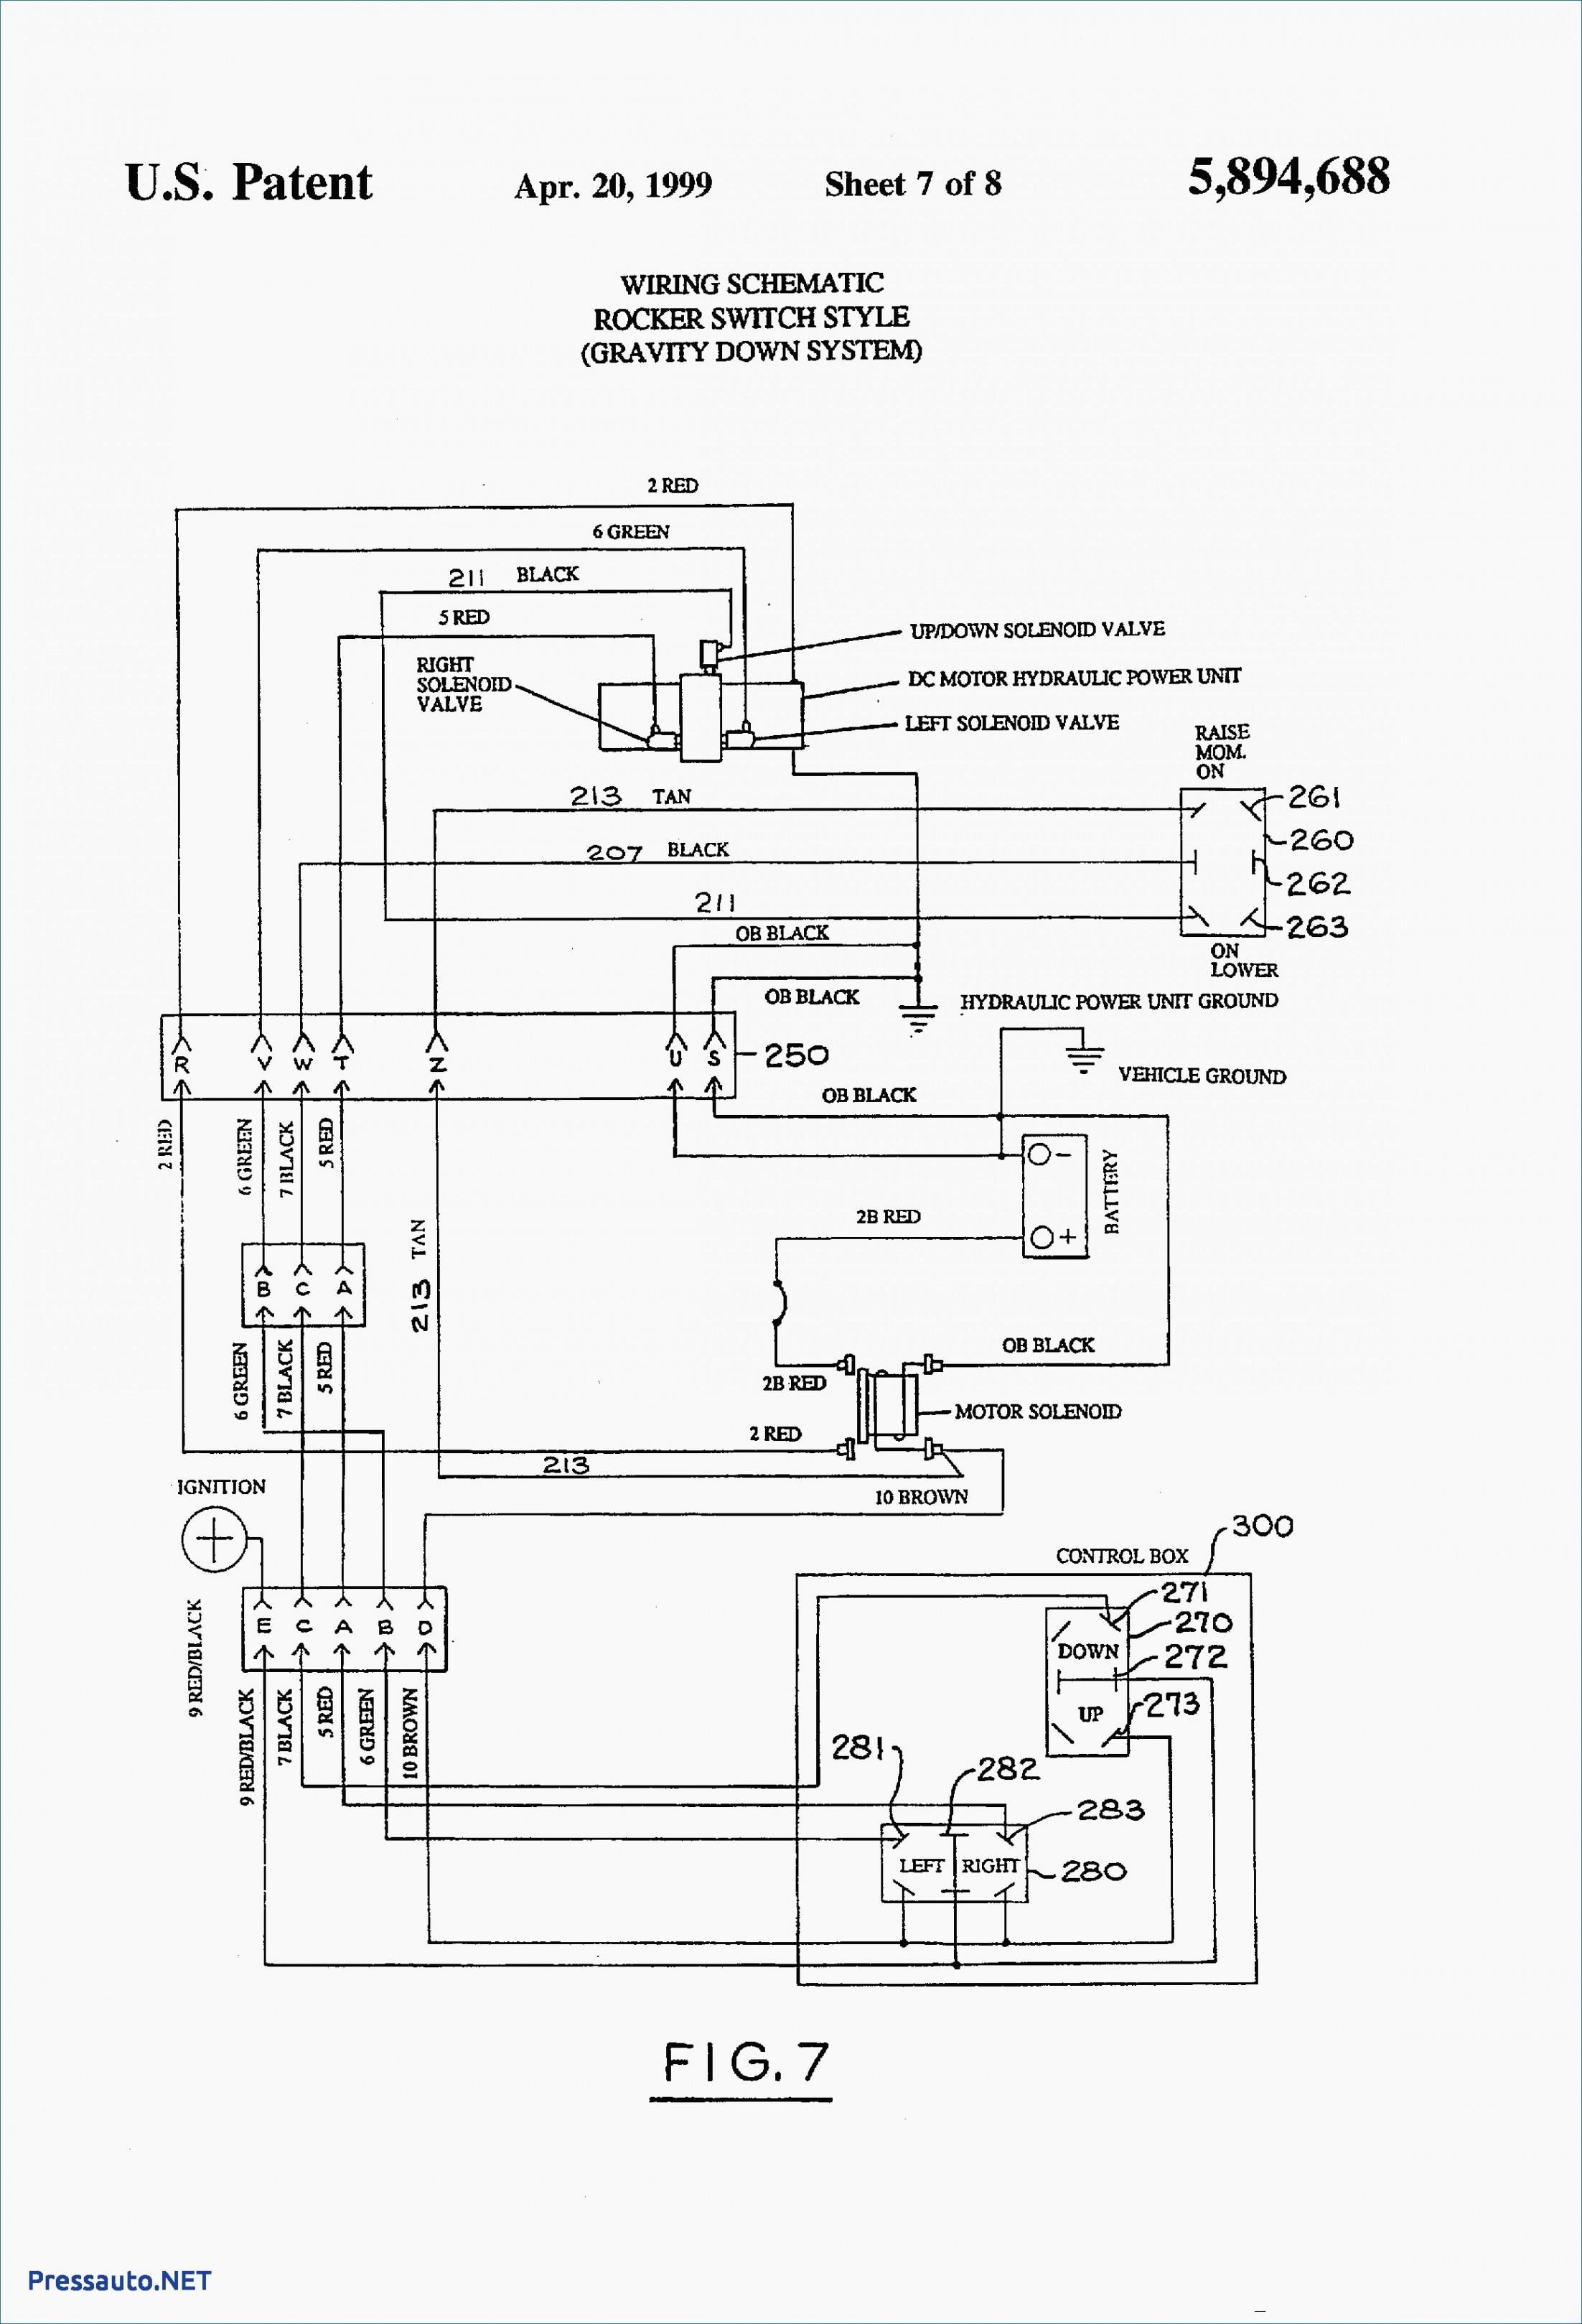 Western Snow Plow Relay Wiring Diagram - Wiring Diagrams Hubs - Western Plow Controller Wiring Diagram